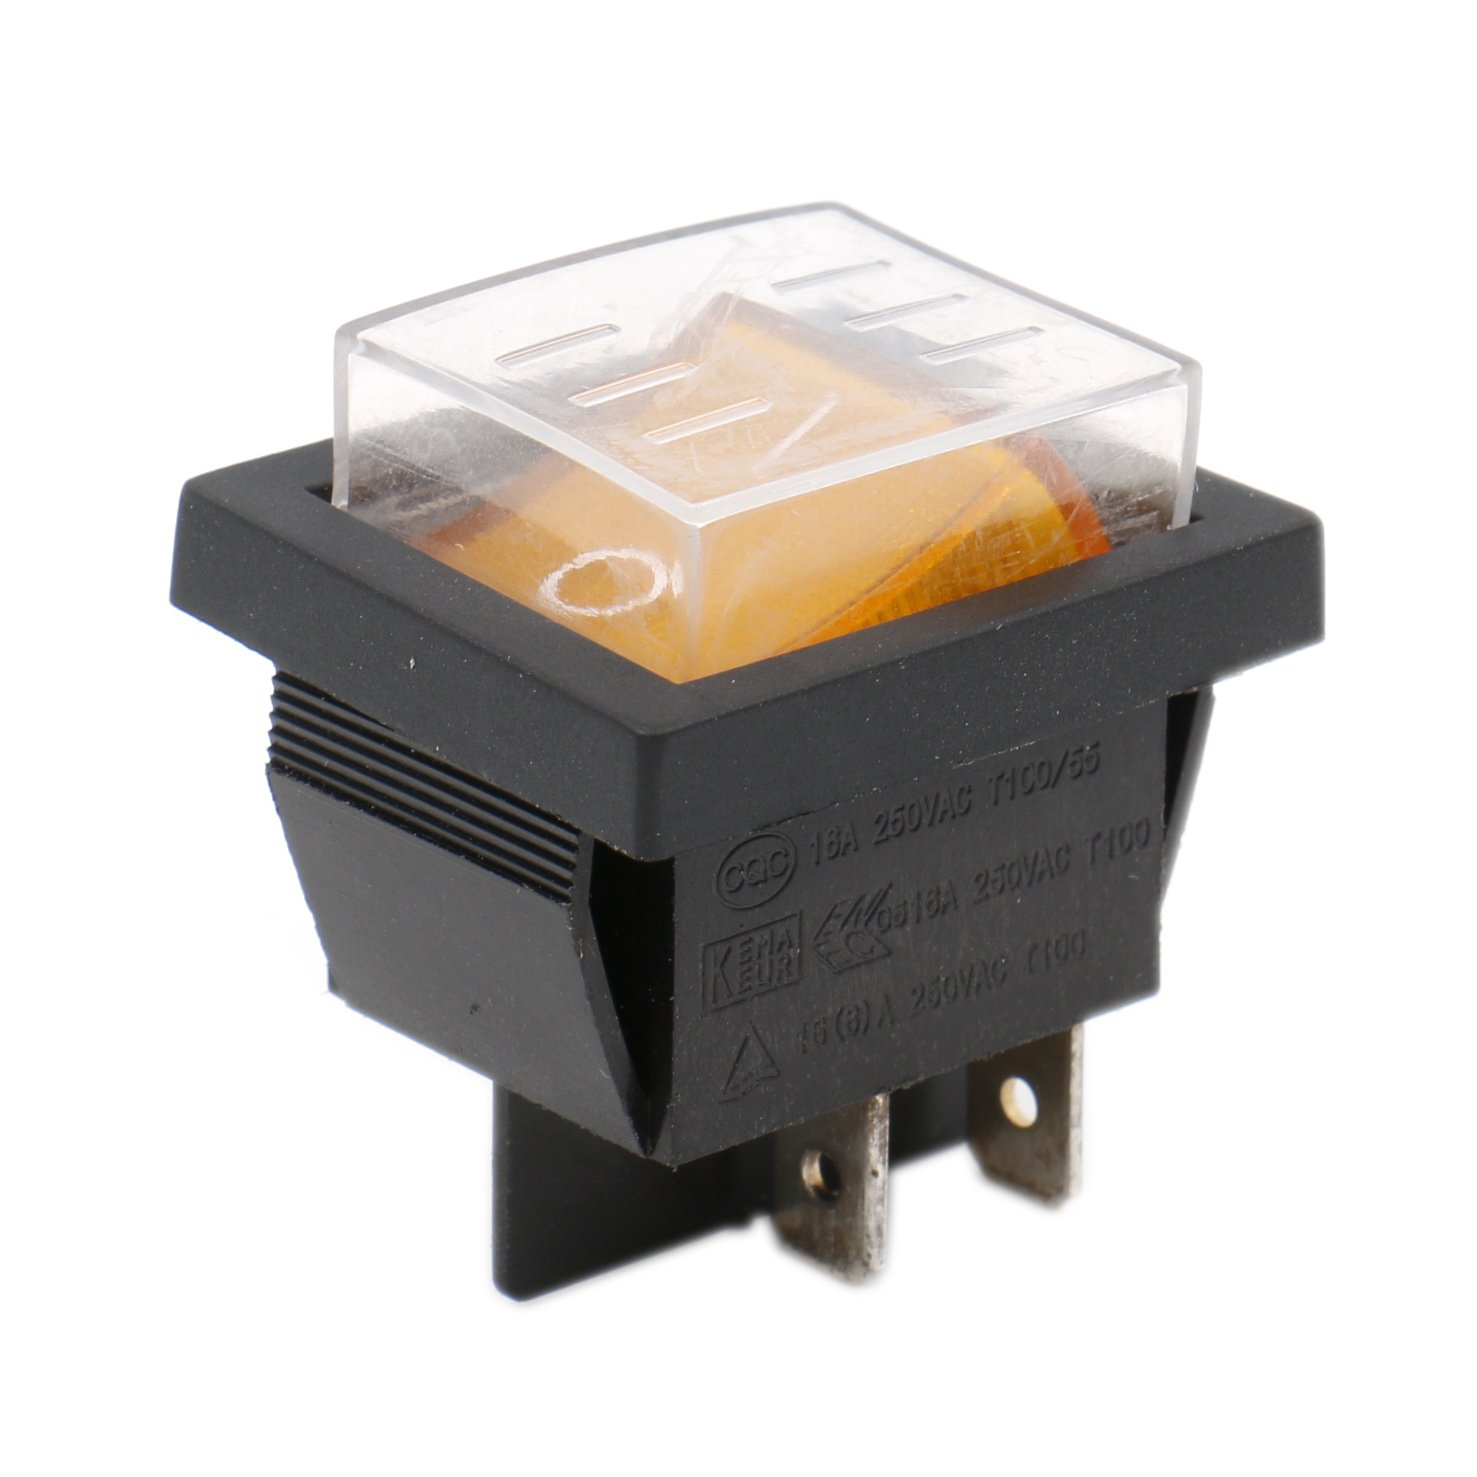 heschen Rocker Schalter ON-OFF-DPST 4 Terminals gelb light 16 A 250 VAC mit wasserfester Abdeckung Ningbo Master Soken Electrical Co.Ltd RK1-01-HS-YP